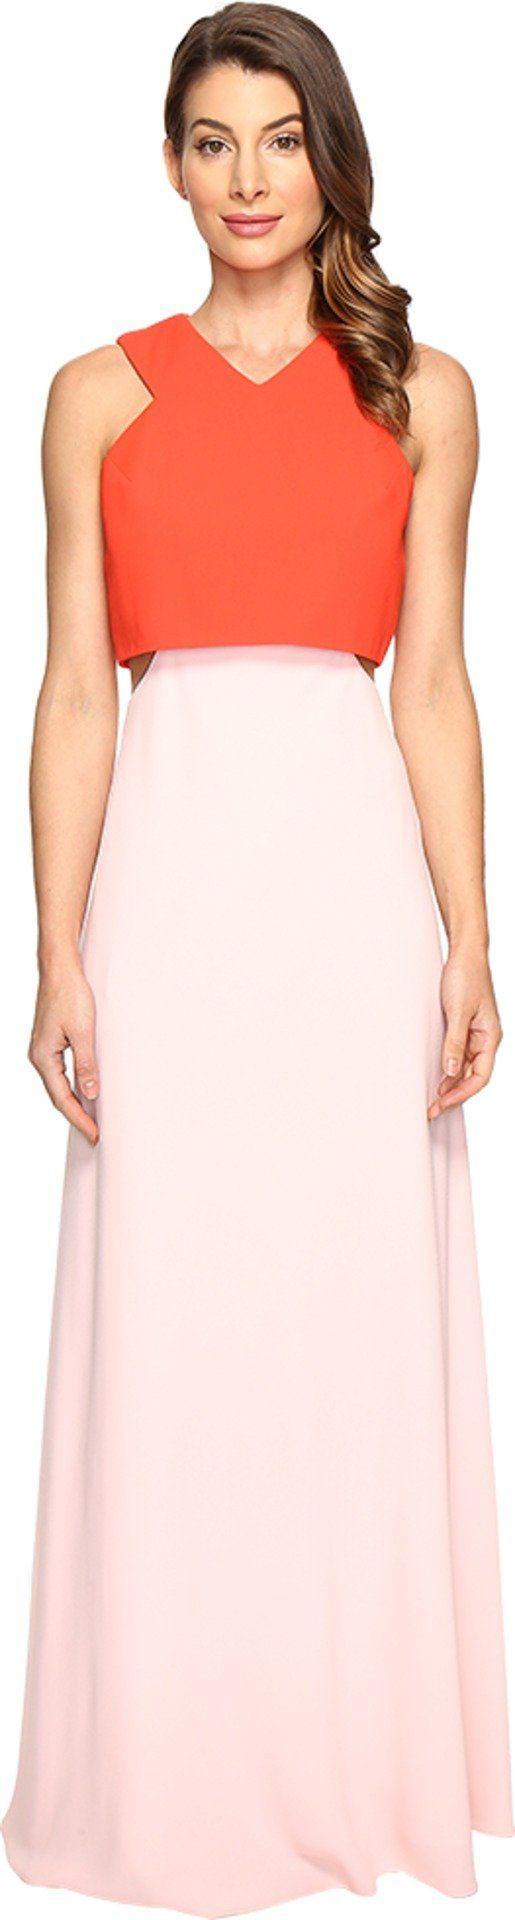 JILL JILL STUART Women's 2-Ply Crepe Popover Dress Tangerine/Ballet Pink Dress